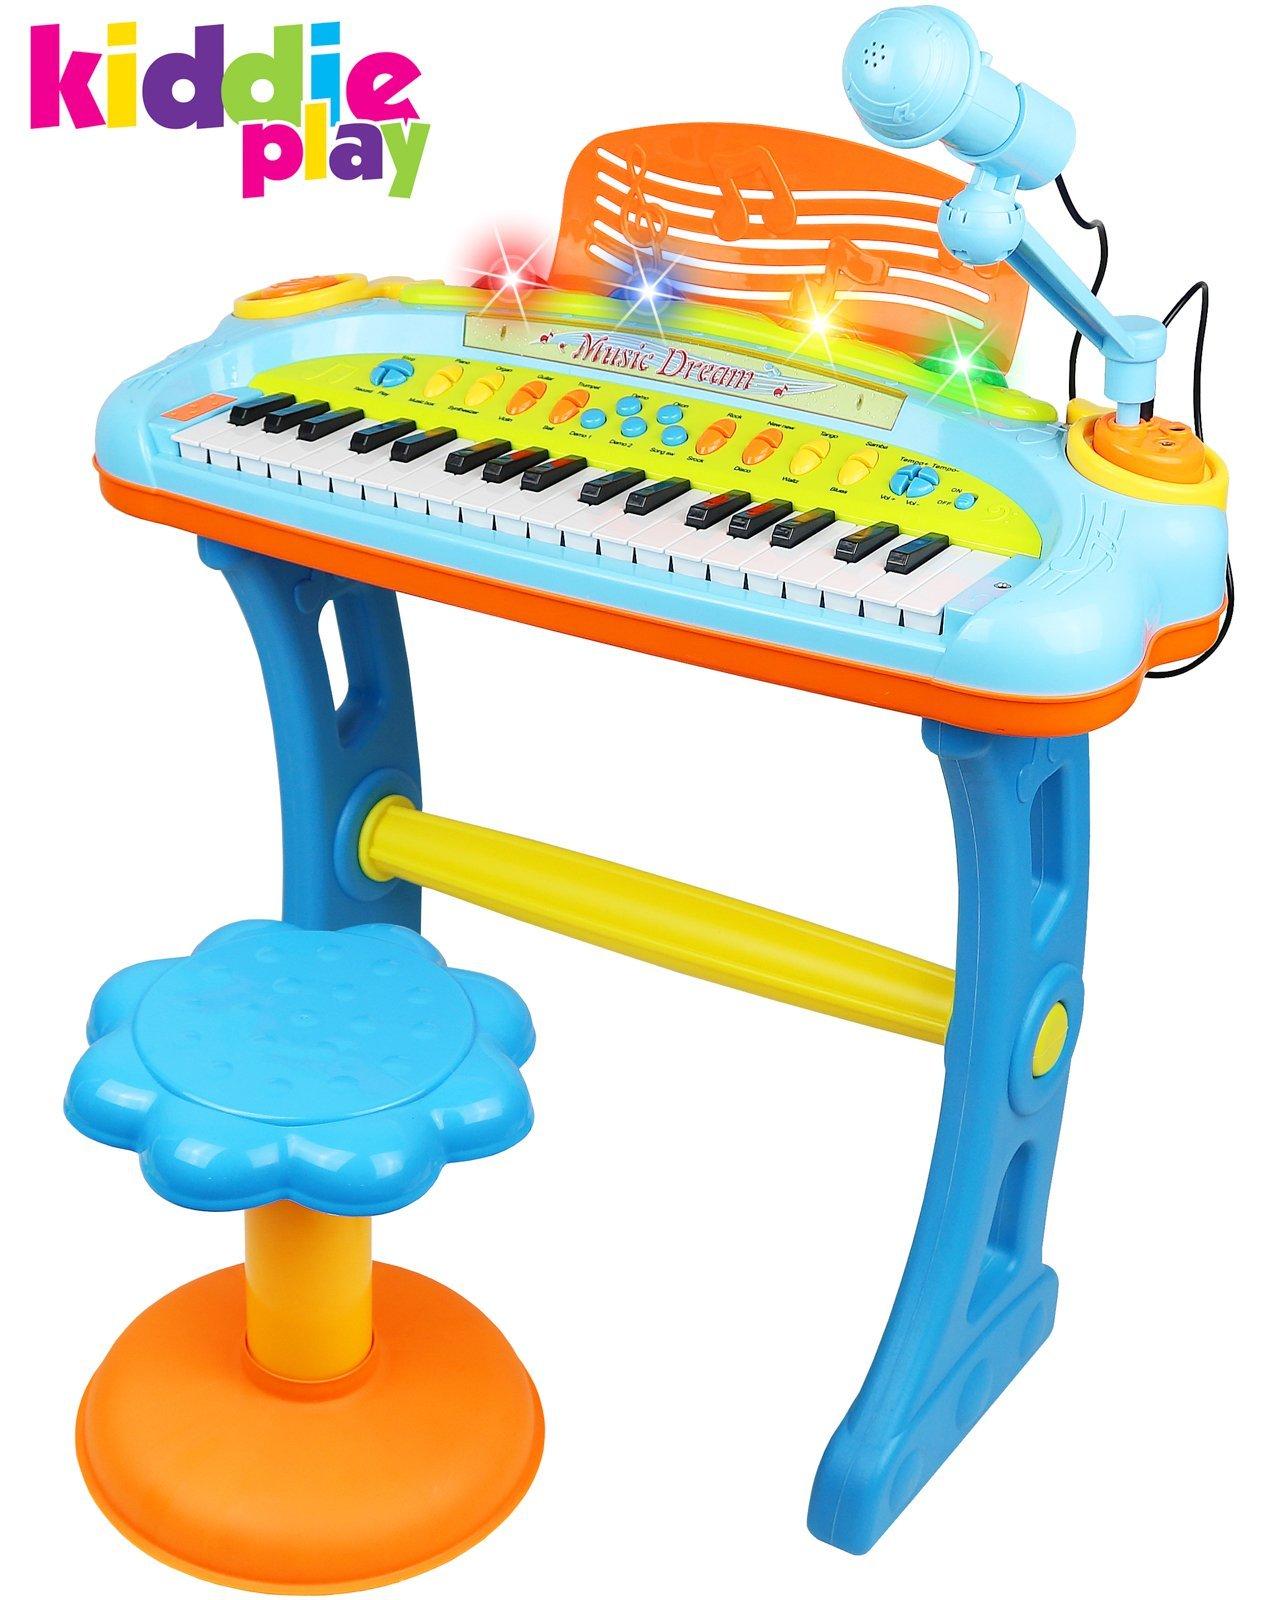 Kiddie Play Electronic Keyboard Microphone